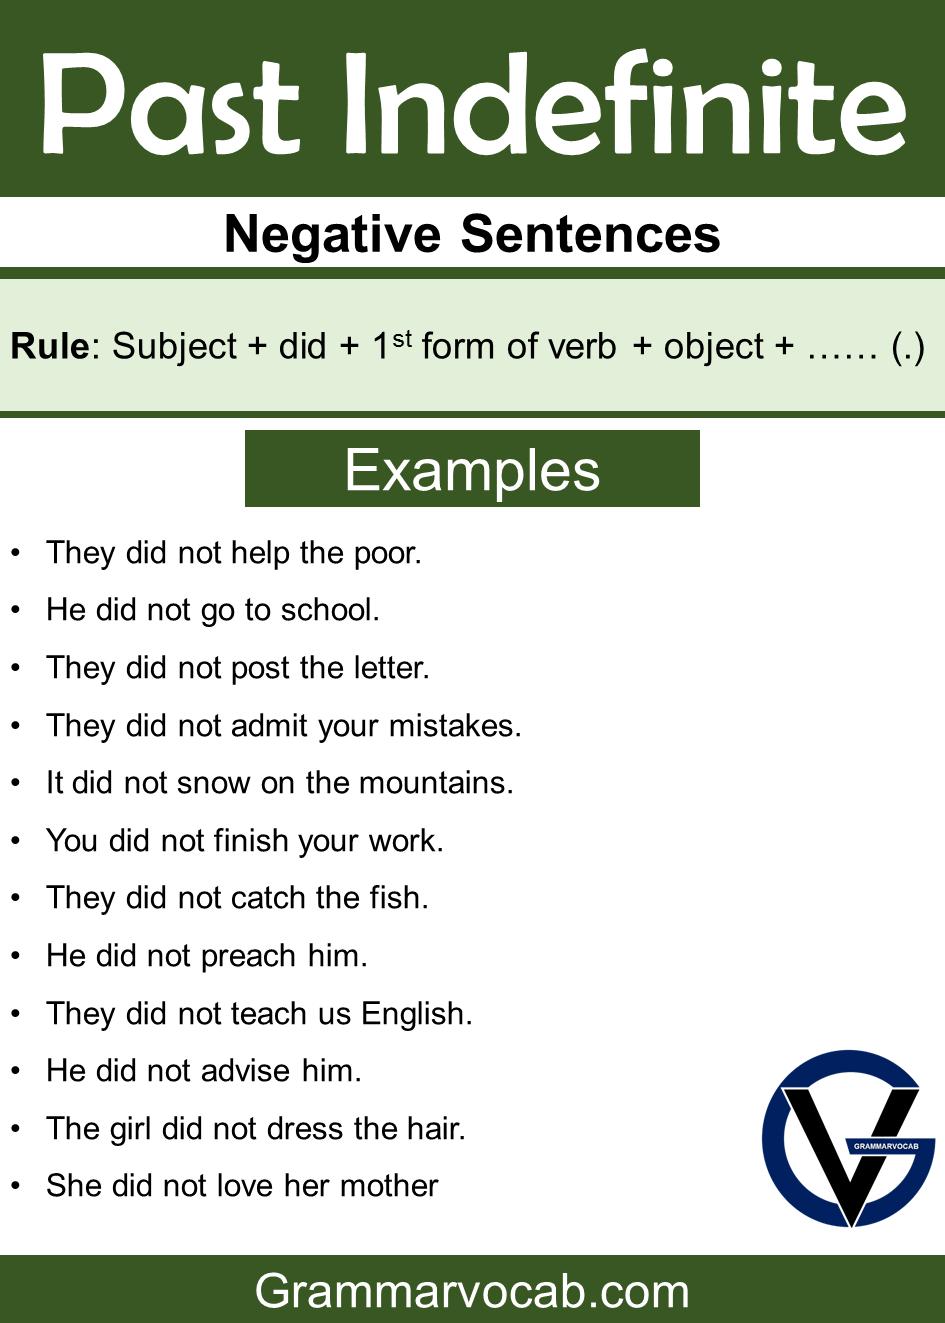 past indefinite tense negative sentences